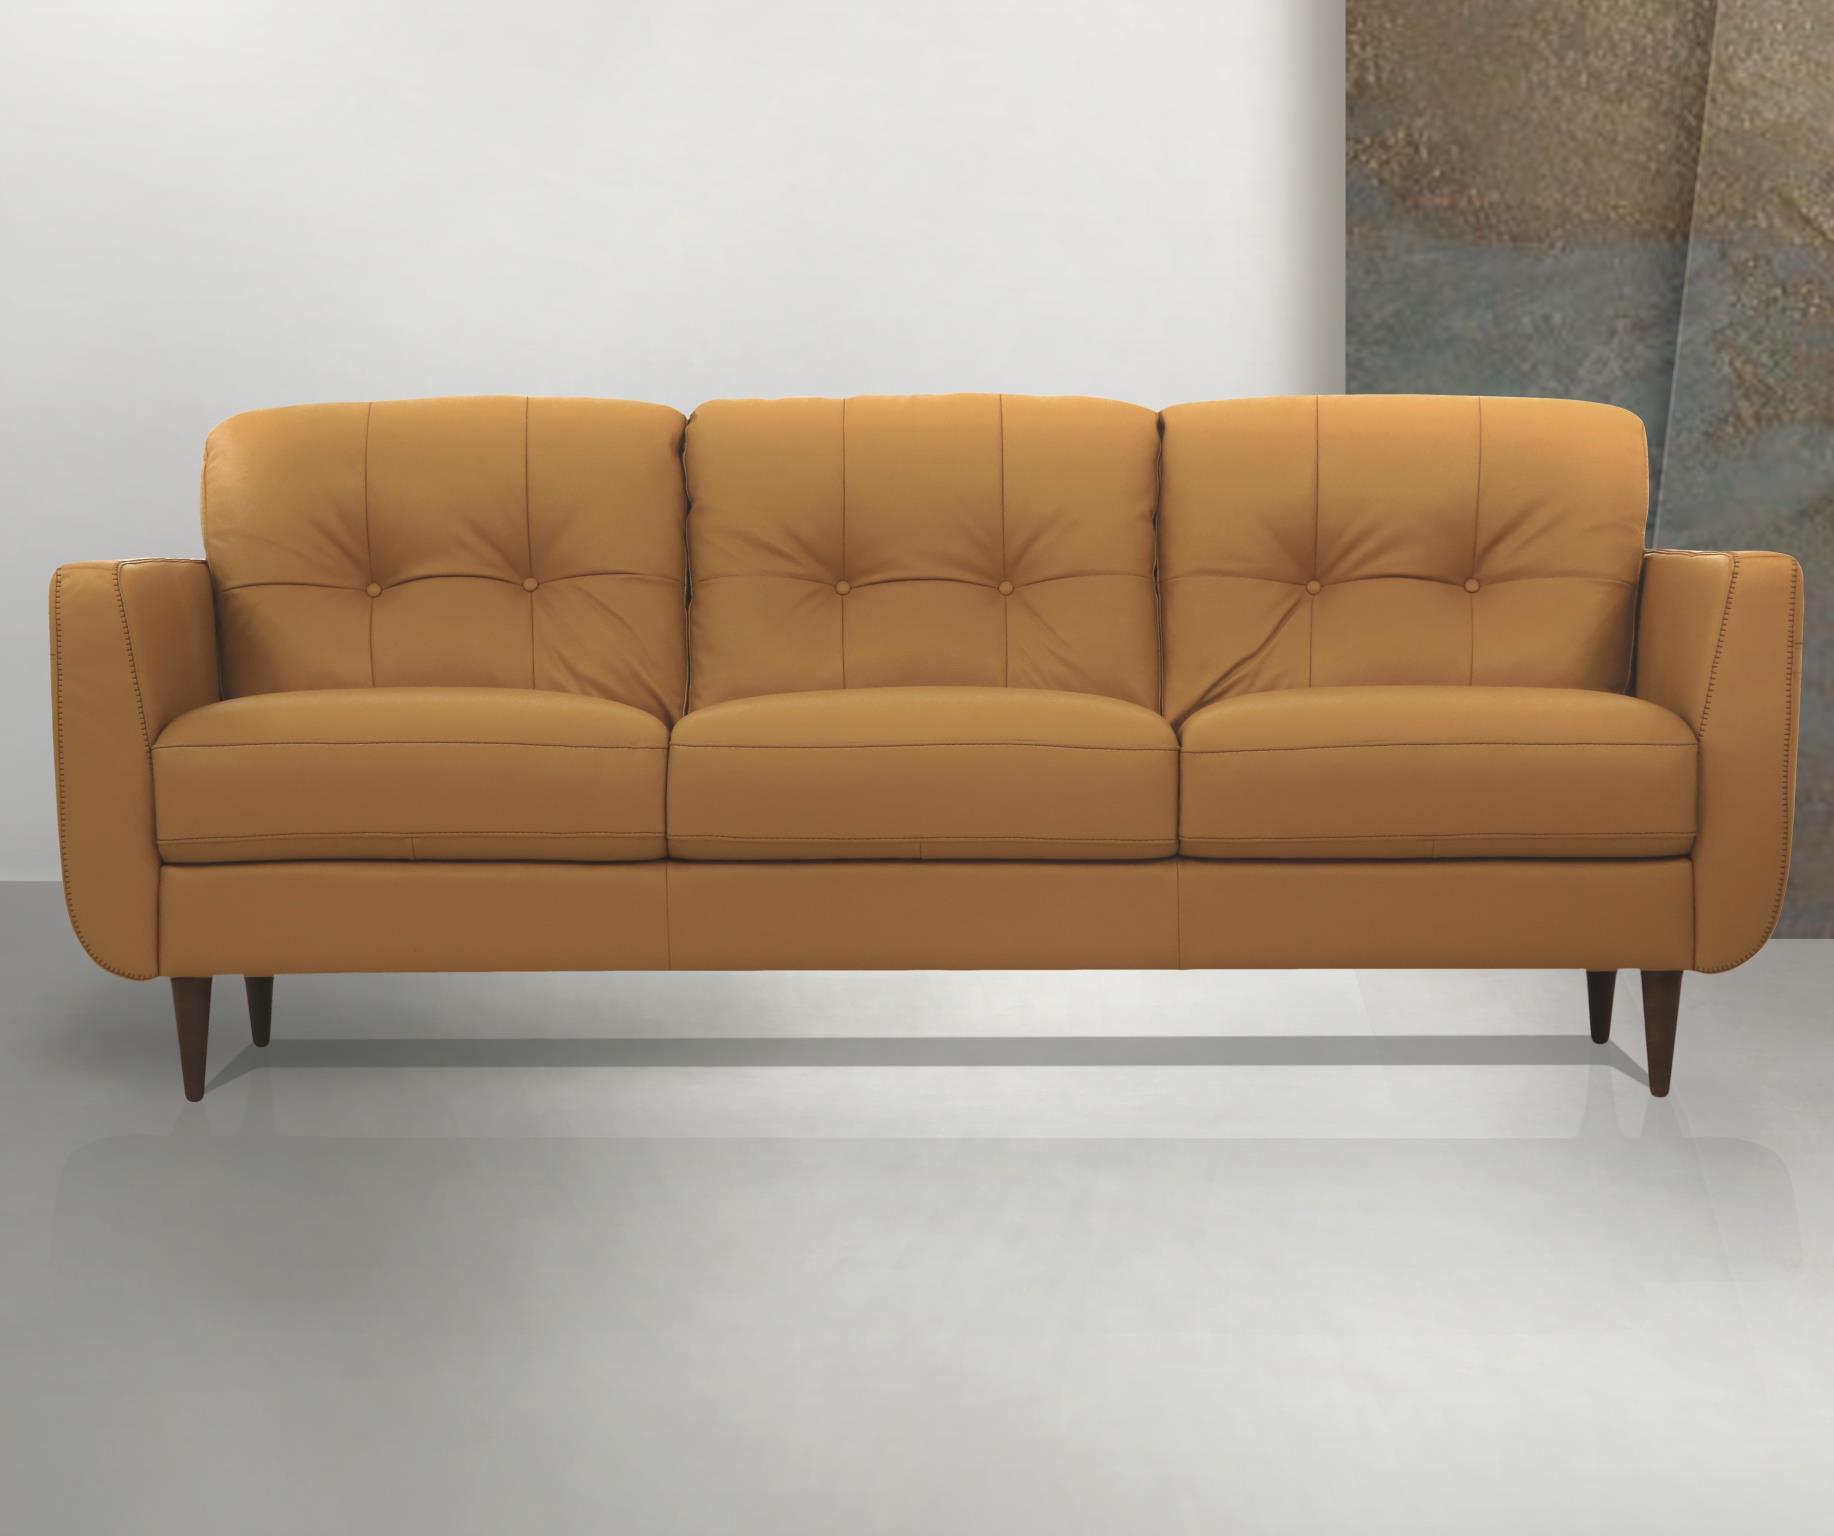 Camel Complete Sofa Set